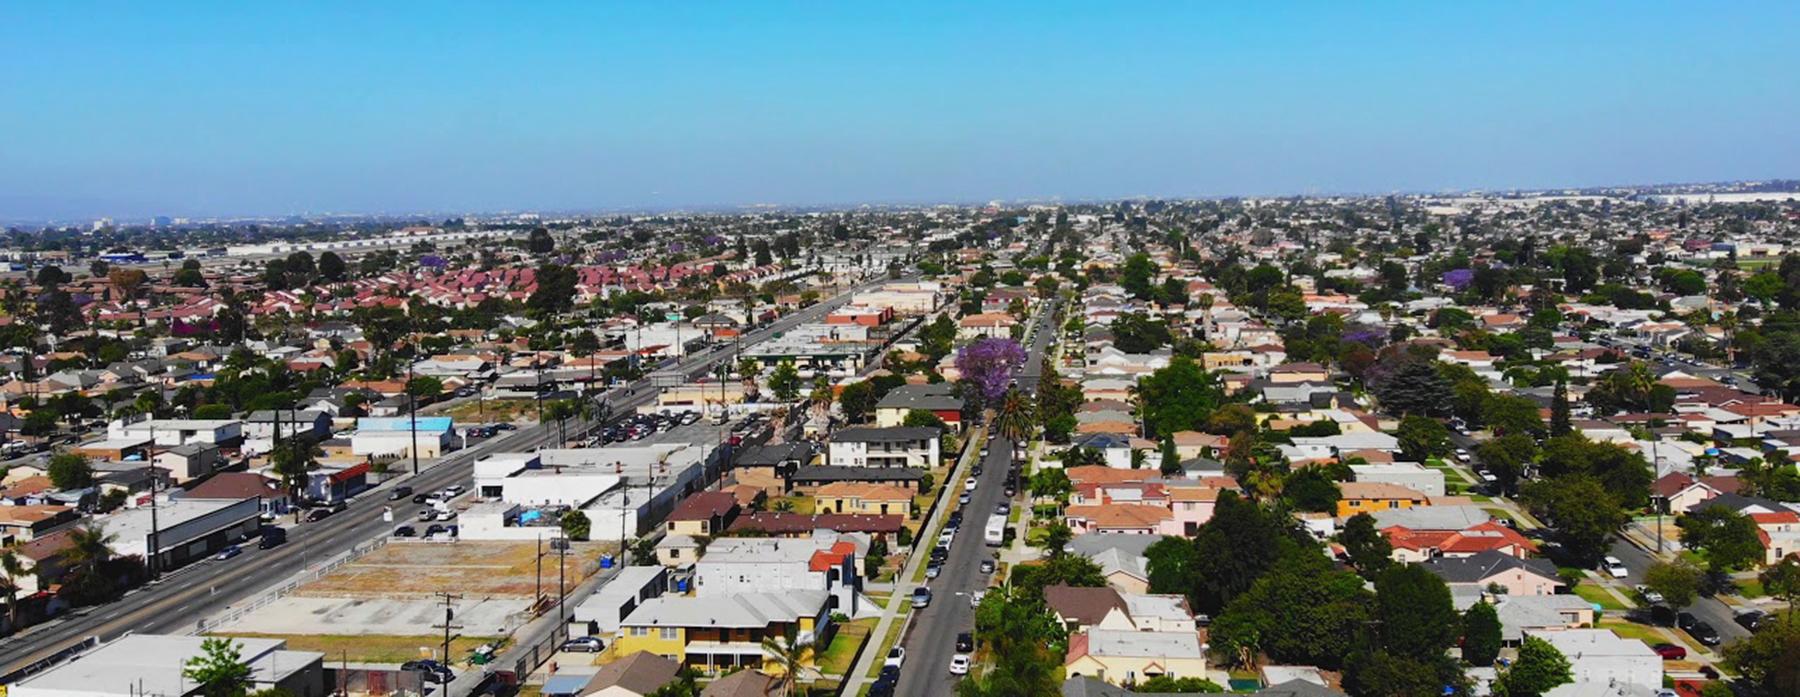 Compton, Californie